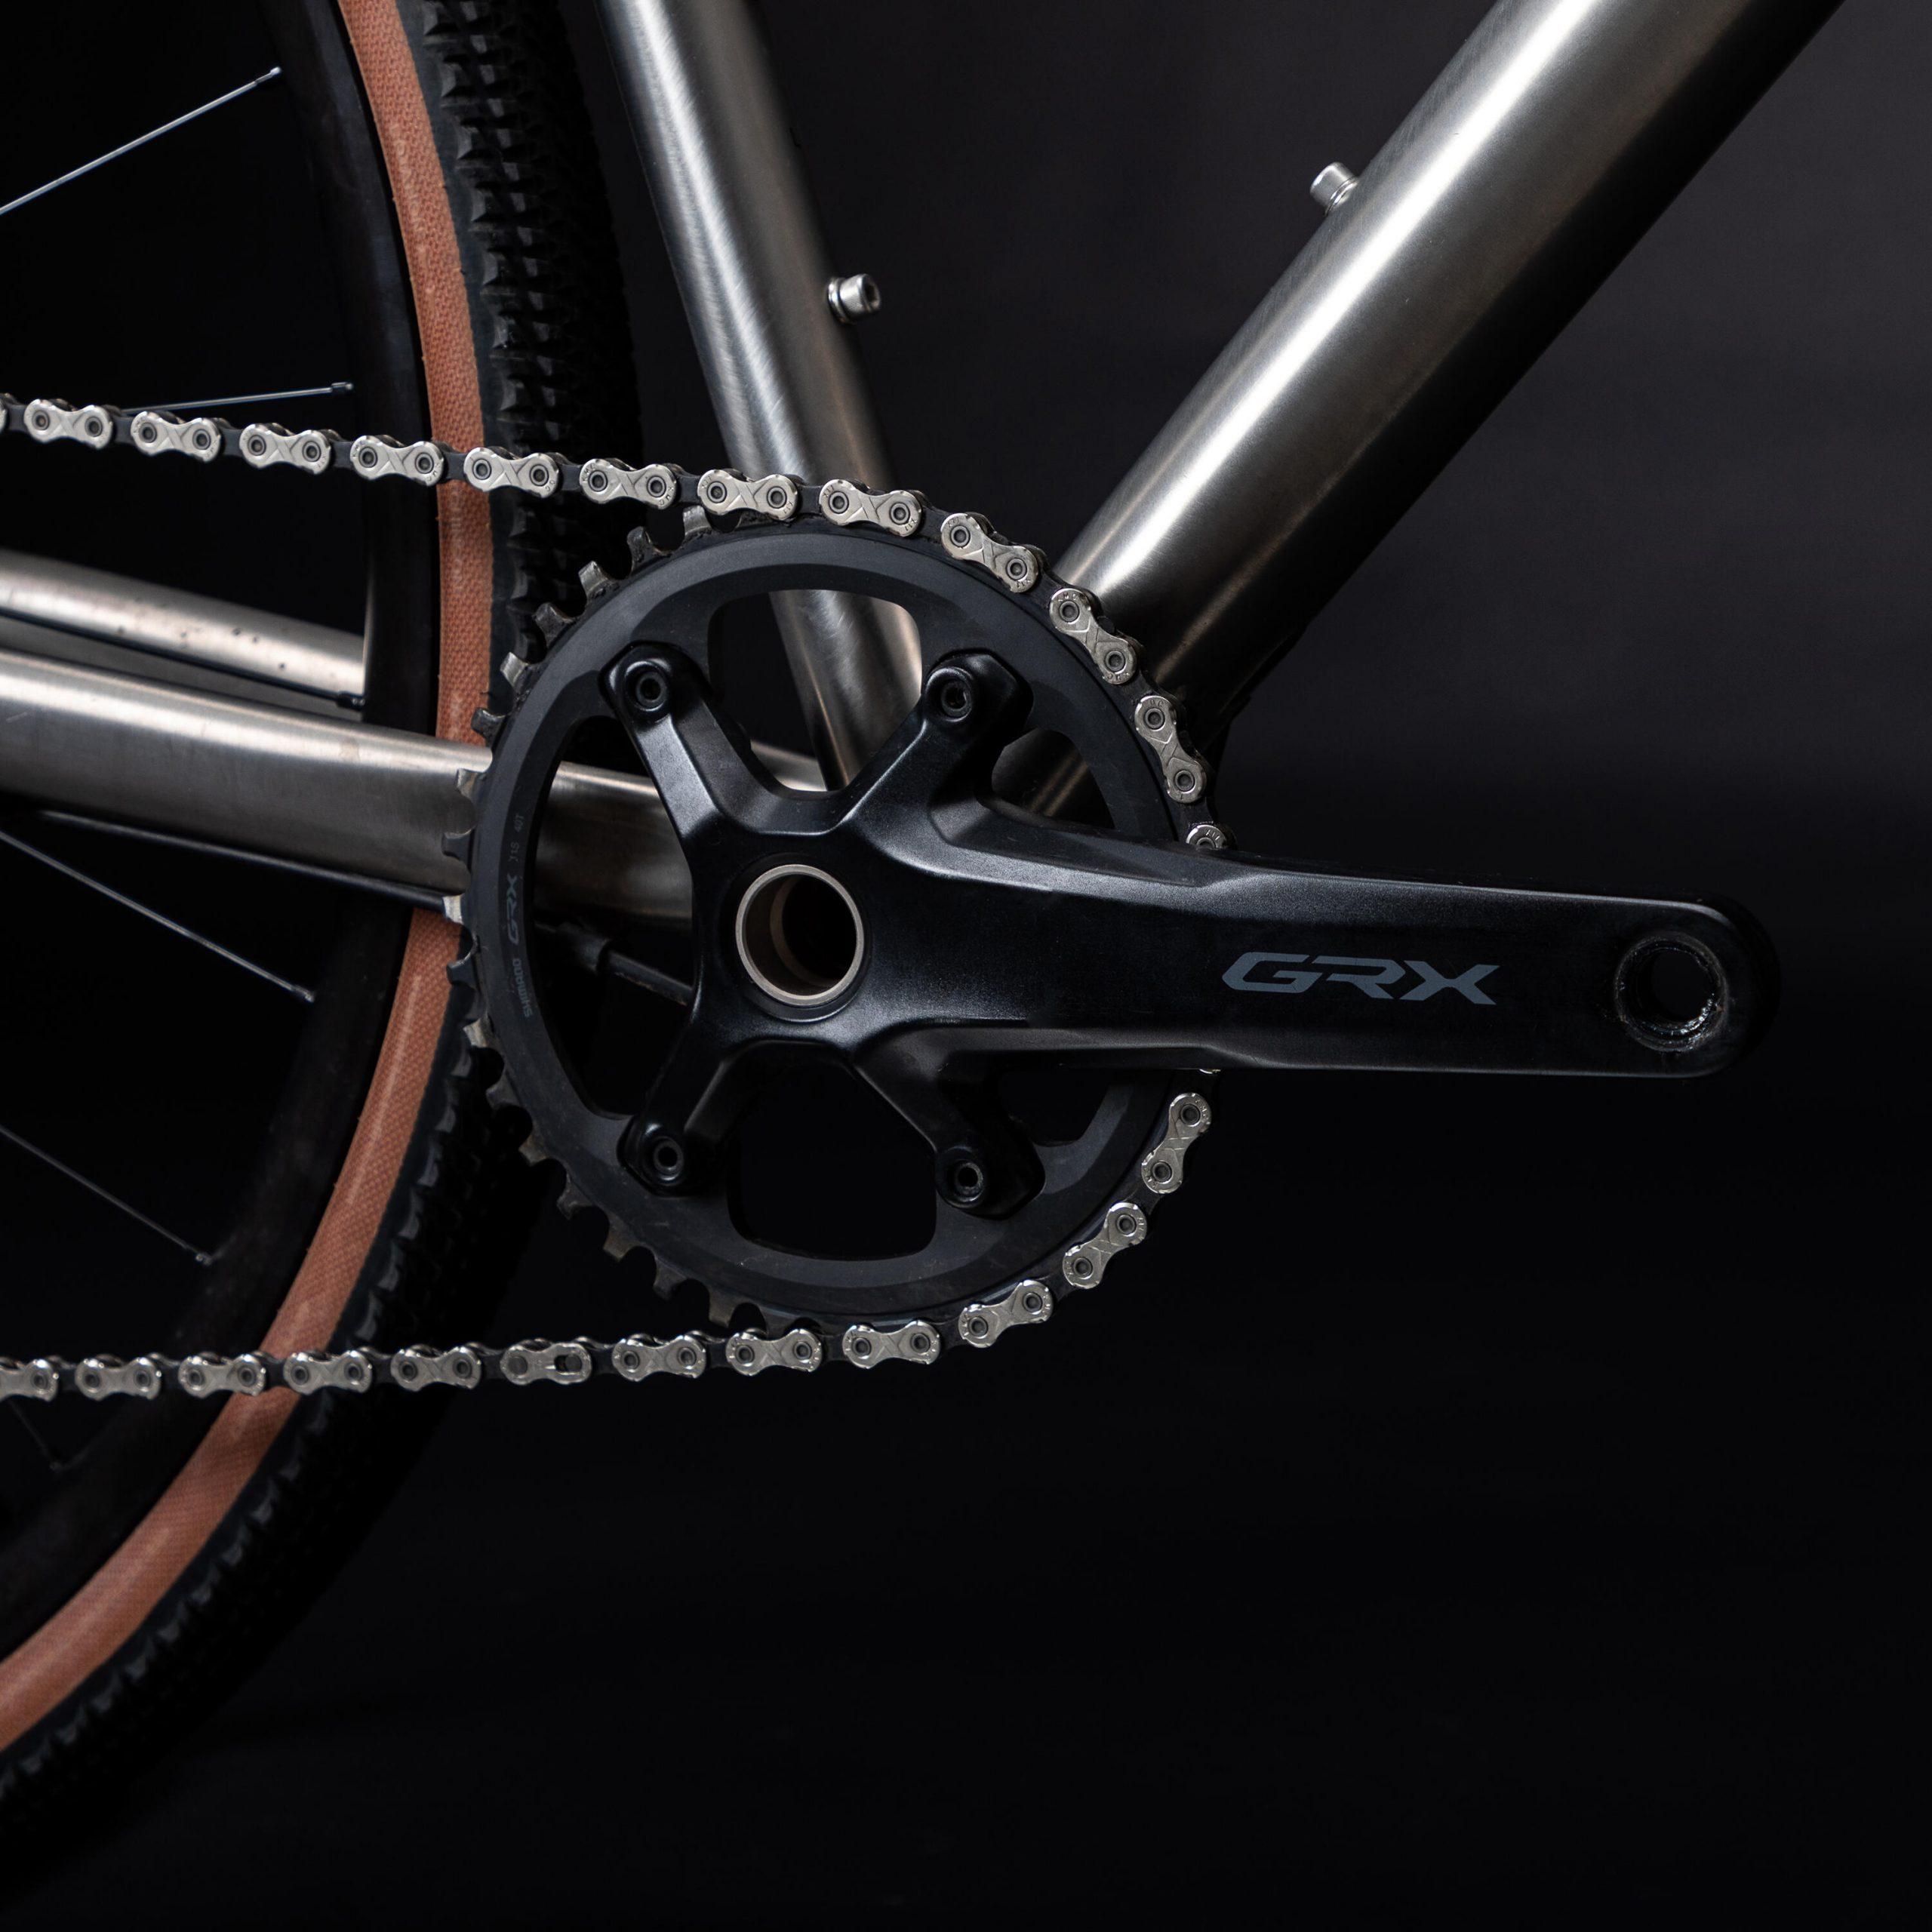 Triban GRVL 900 gravel bike